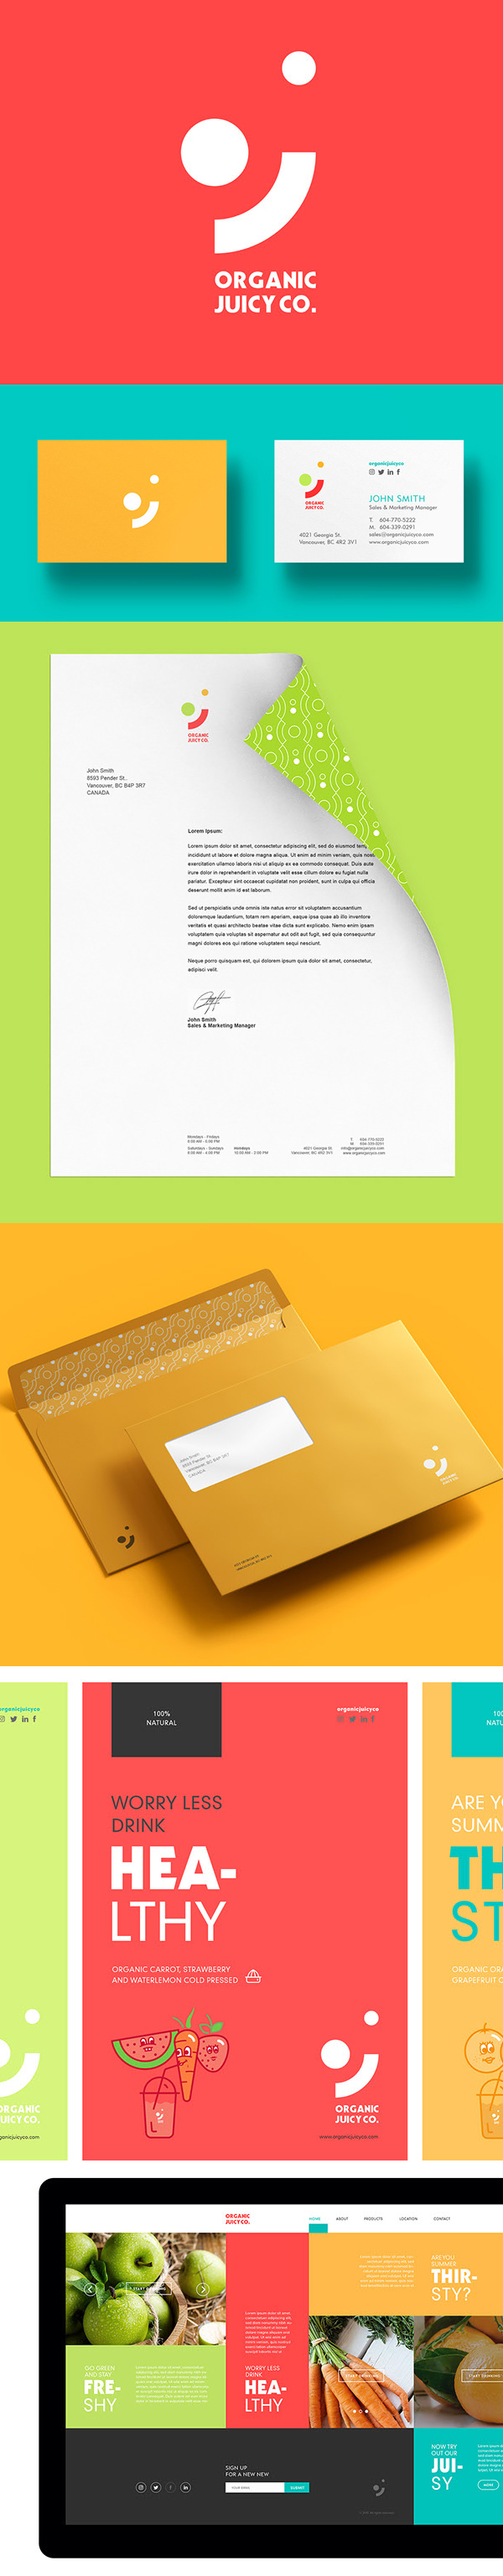 Branding: Organic Juicy Co. Logo Design and Branding by Broklin Onjei